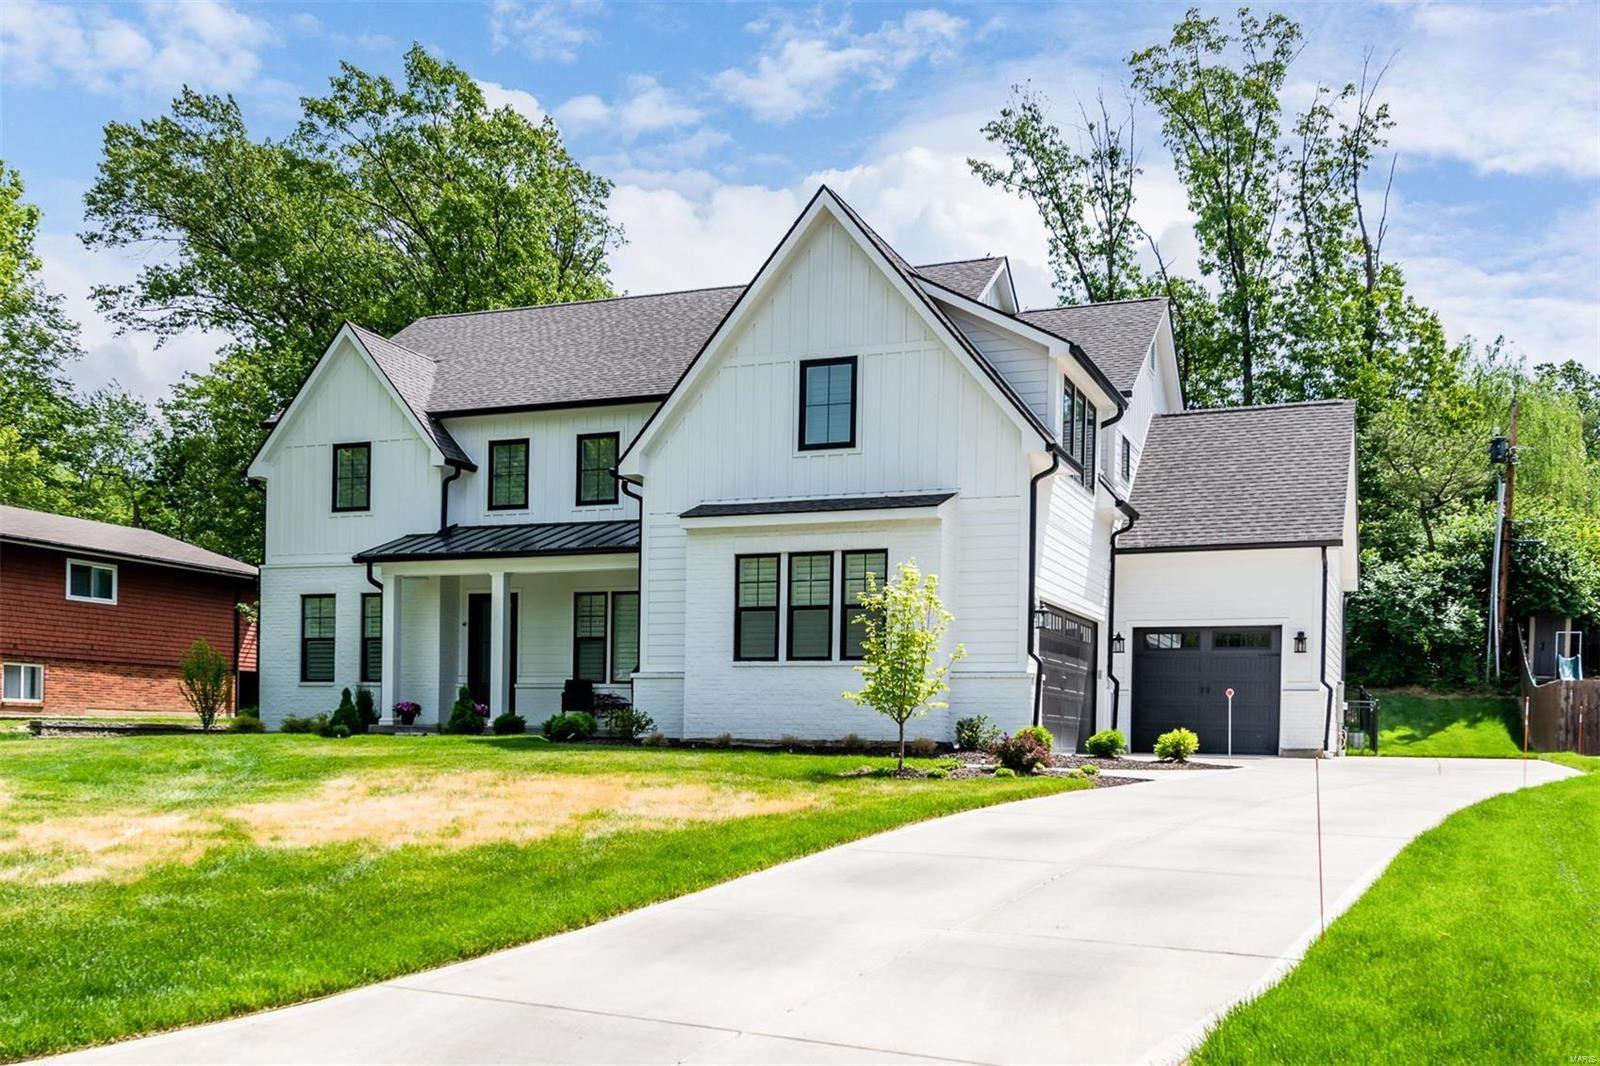 629 Graeser Lane Lot 2, Saint Louis, MO 63141 - MLS#: 21024511